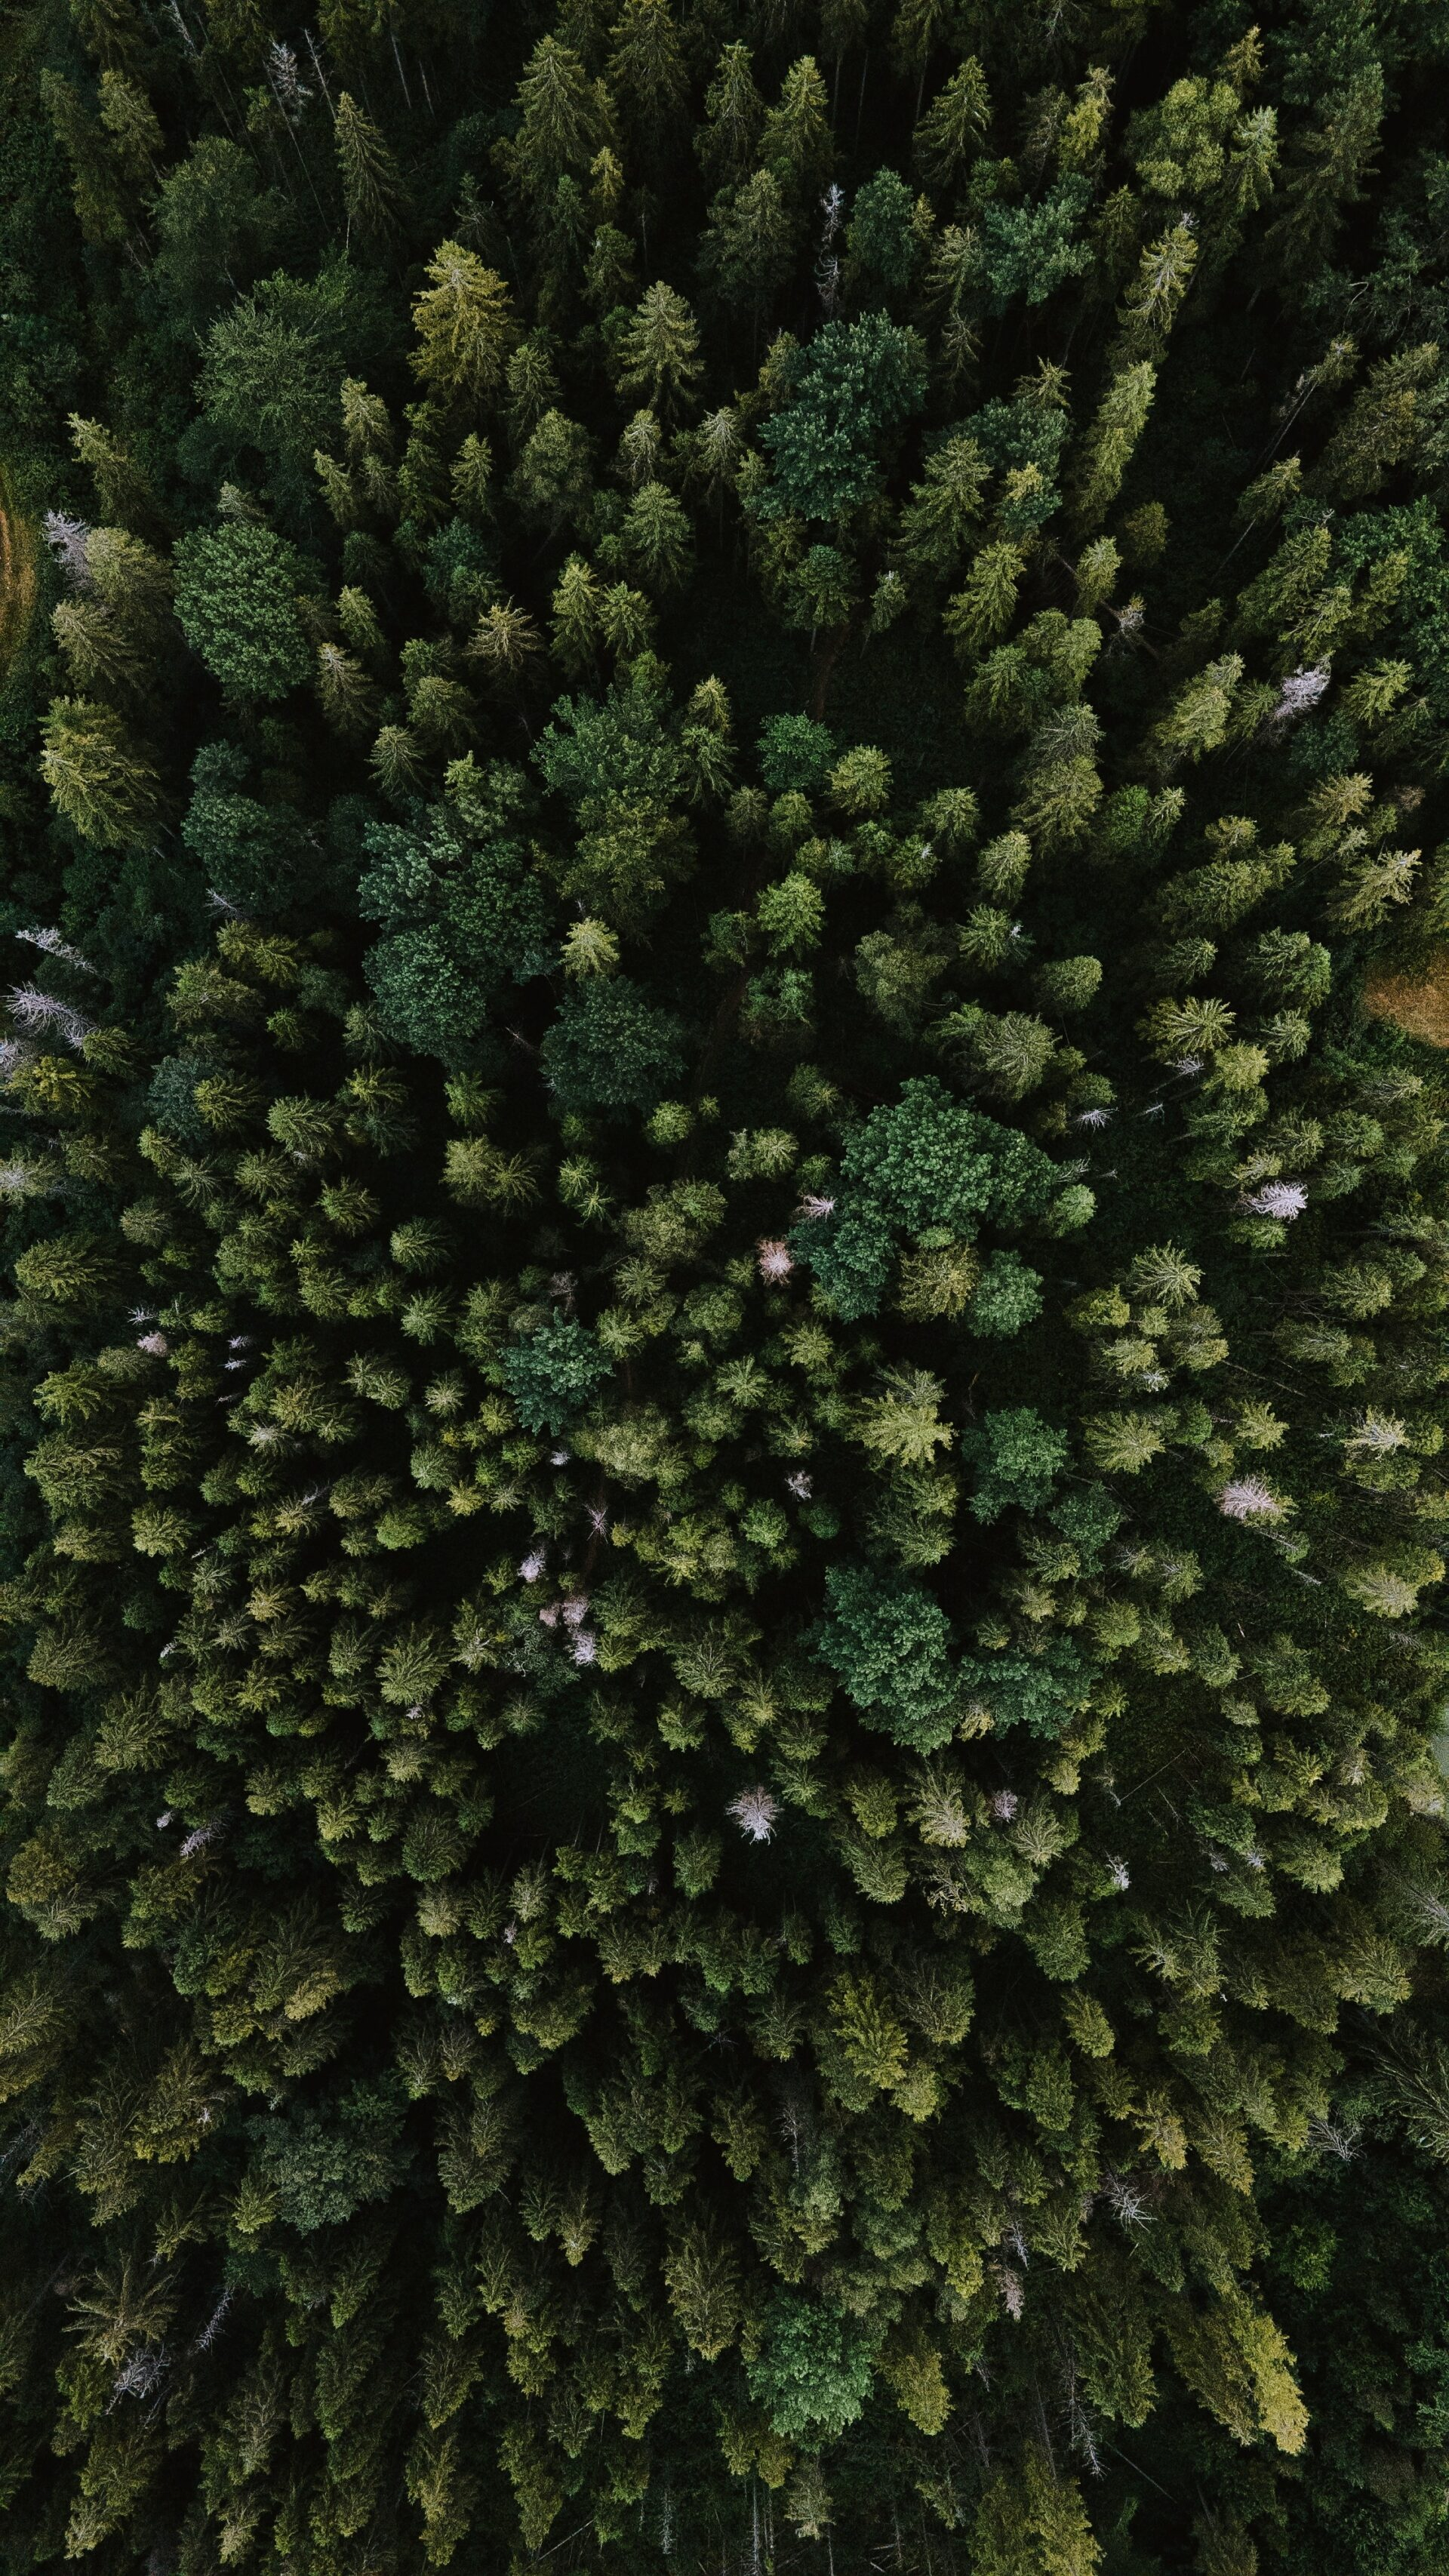 flygfoto av barrskog.